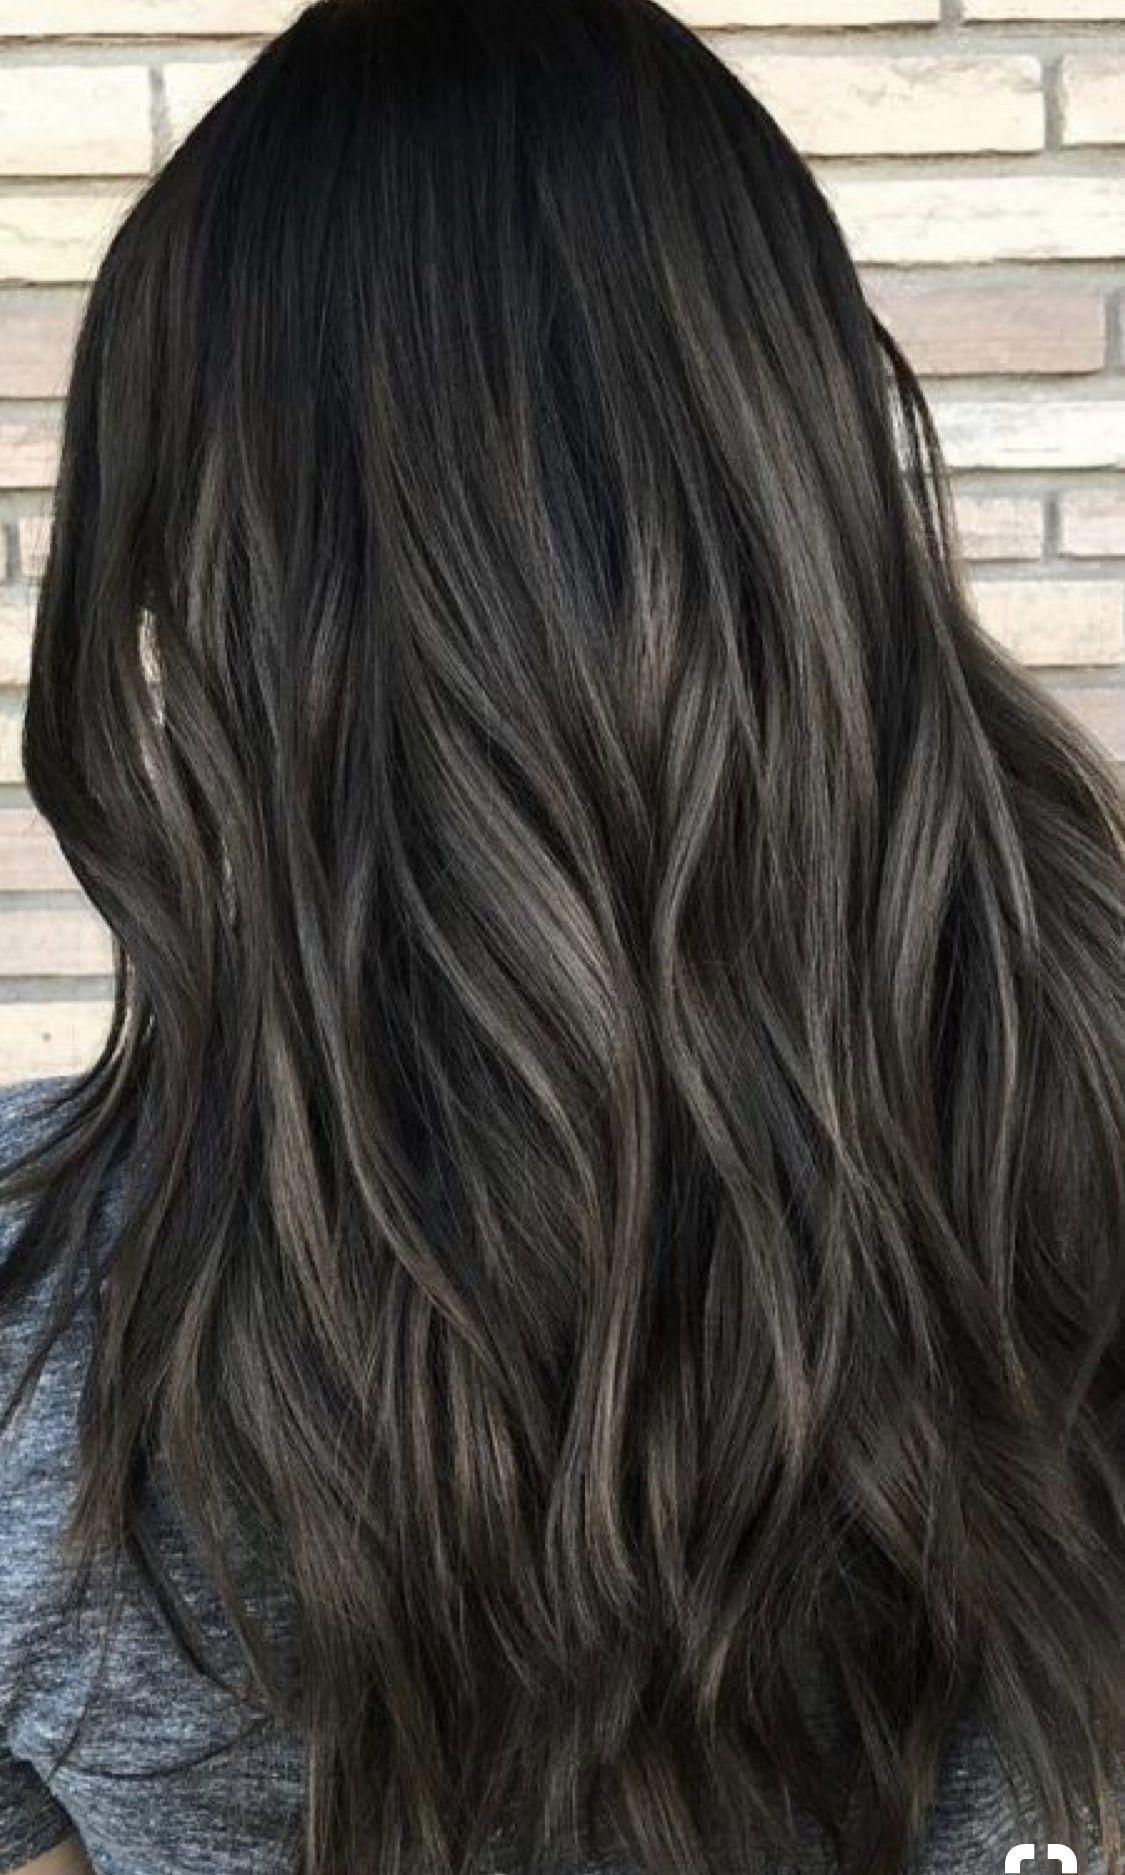 Pin By Ashley Borling On Hairstyles Ash Hair Color Ash Brown Hair Color Brown Hair Balayage